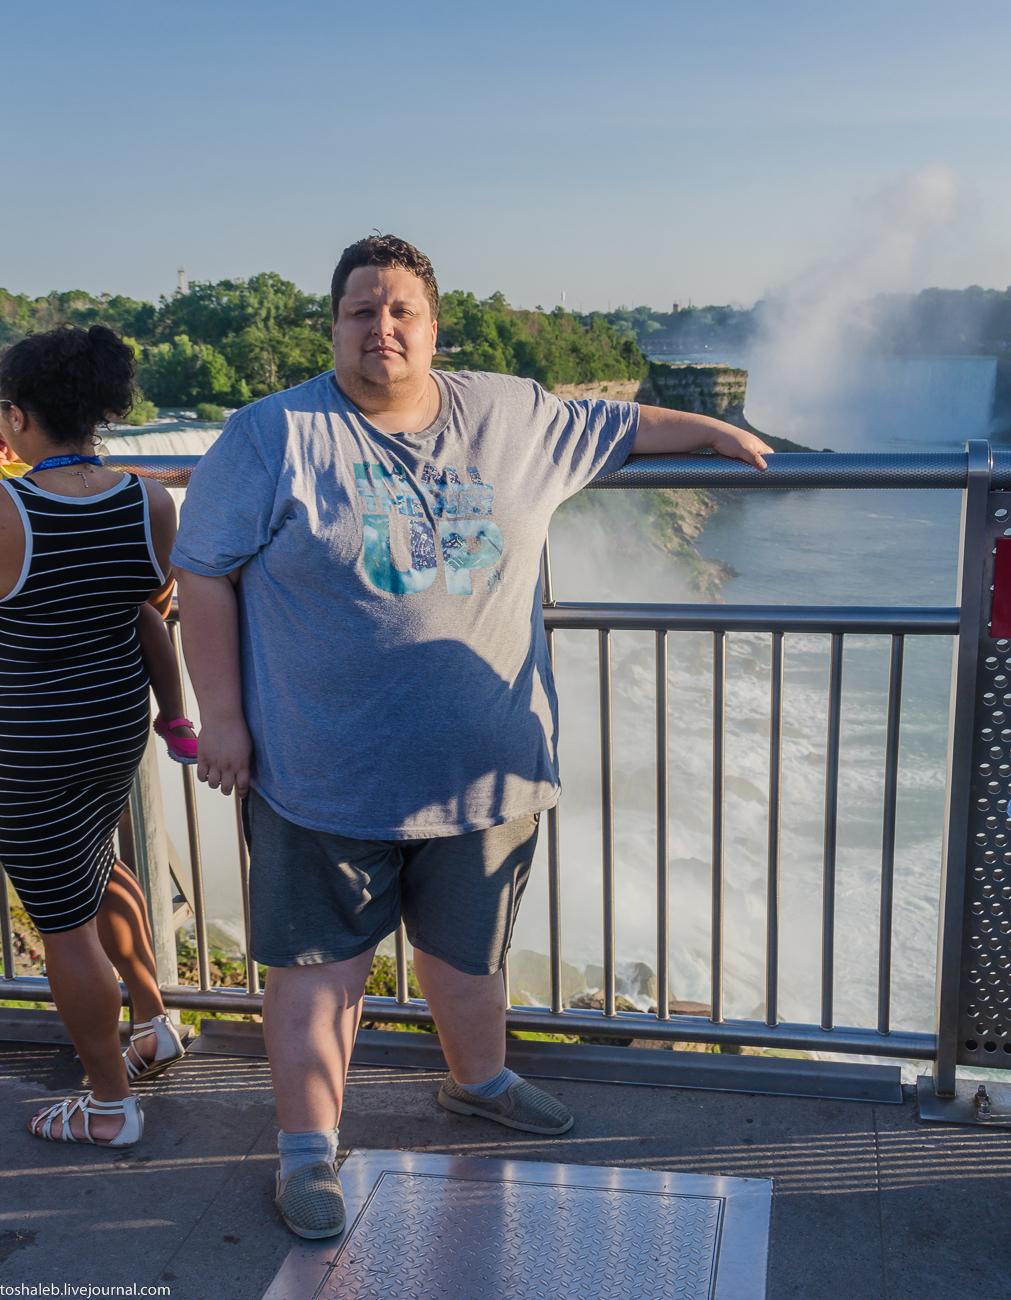 Niagara_Falls-46